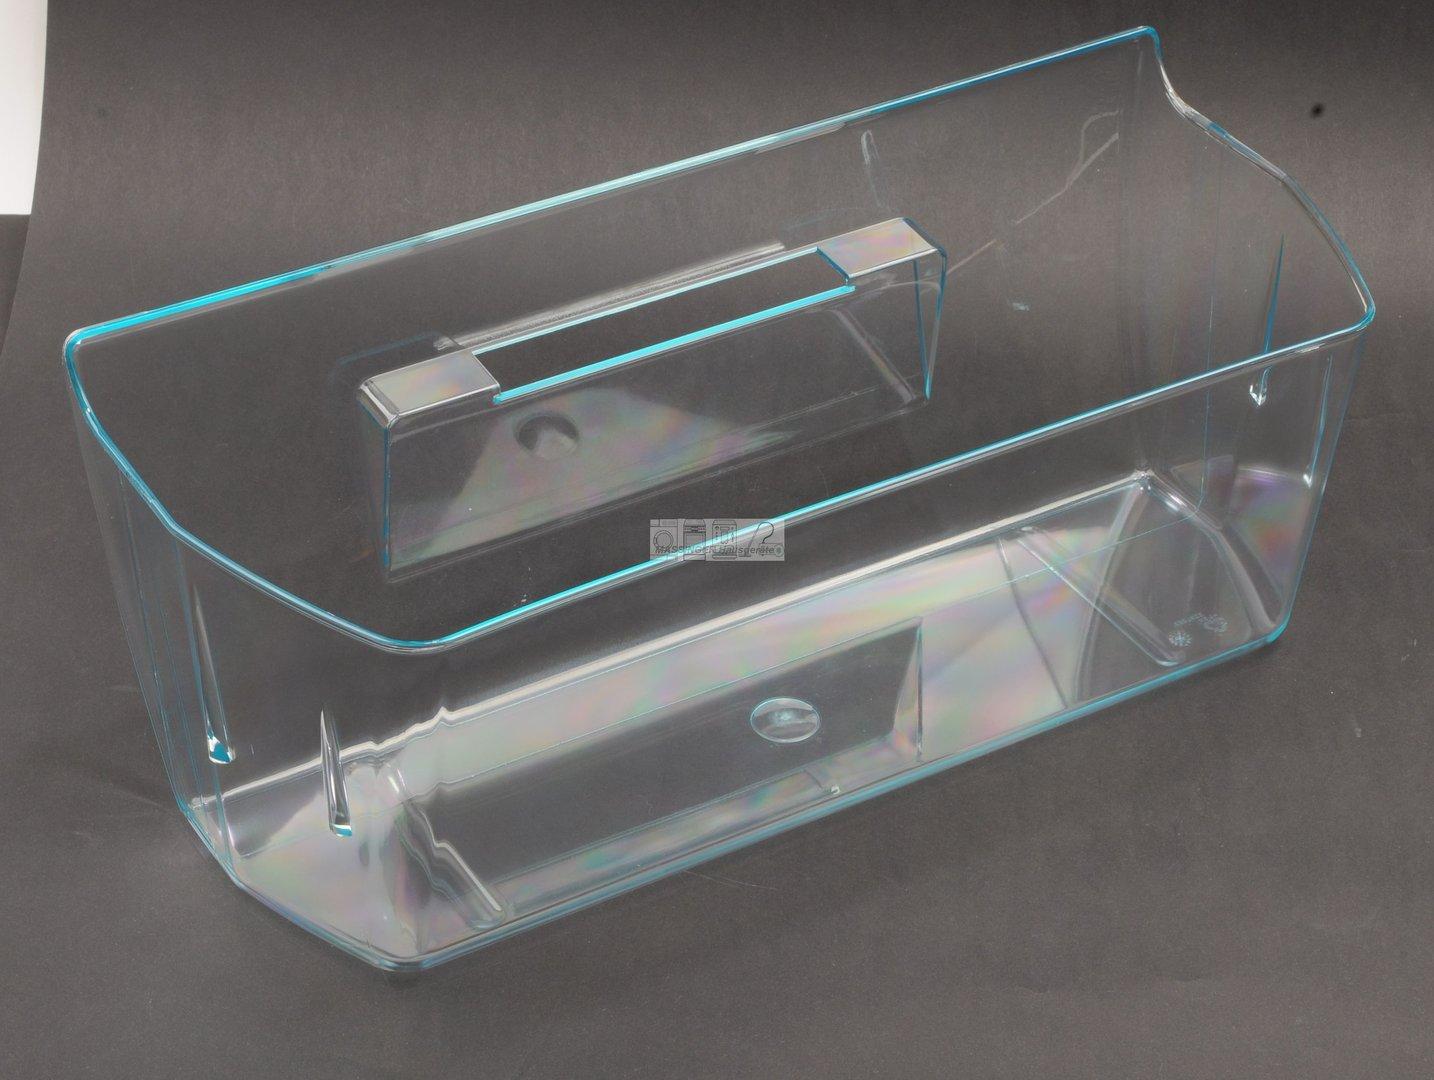 Aeg Kühlschrank Wasser : Bosch kühlschrank immer wasser unter gemüsefach aeg kühlschrank